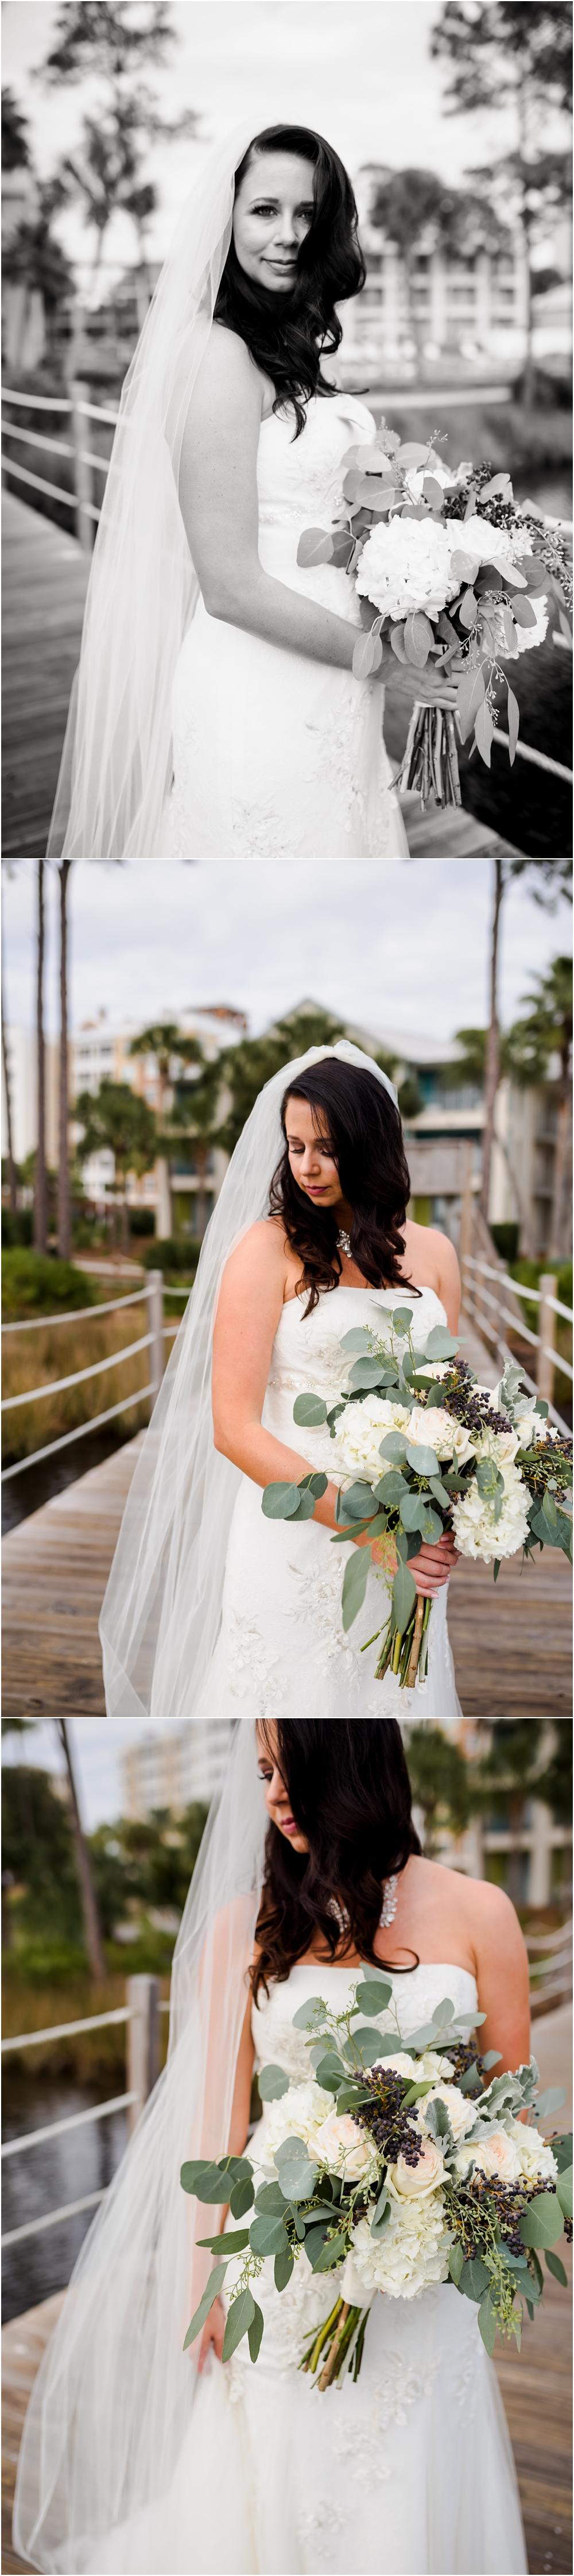 quinn-bay-point-sheraton-florida-wedding-photographer-kiersten-grant-60.jpg